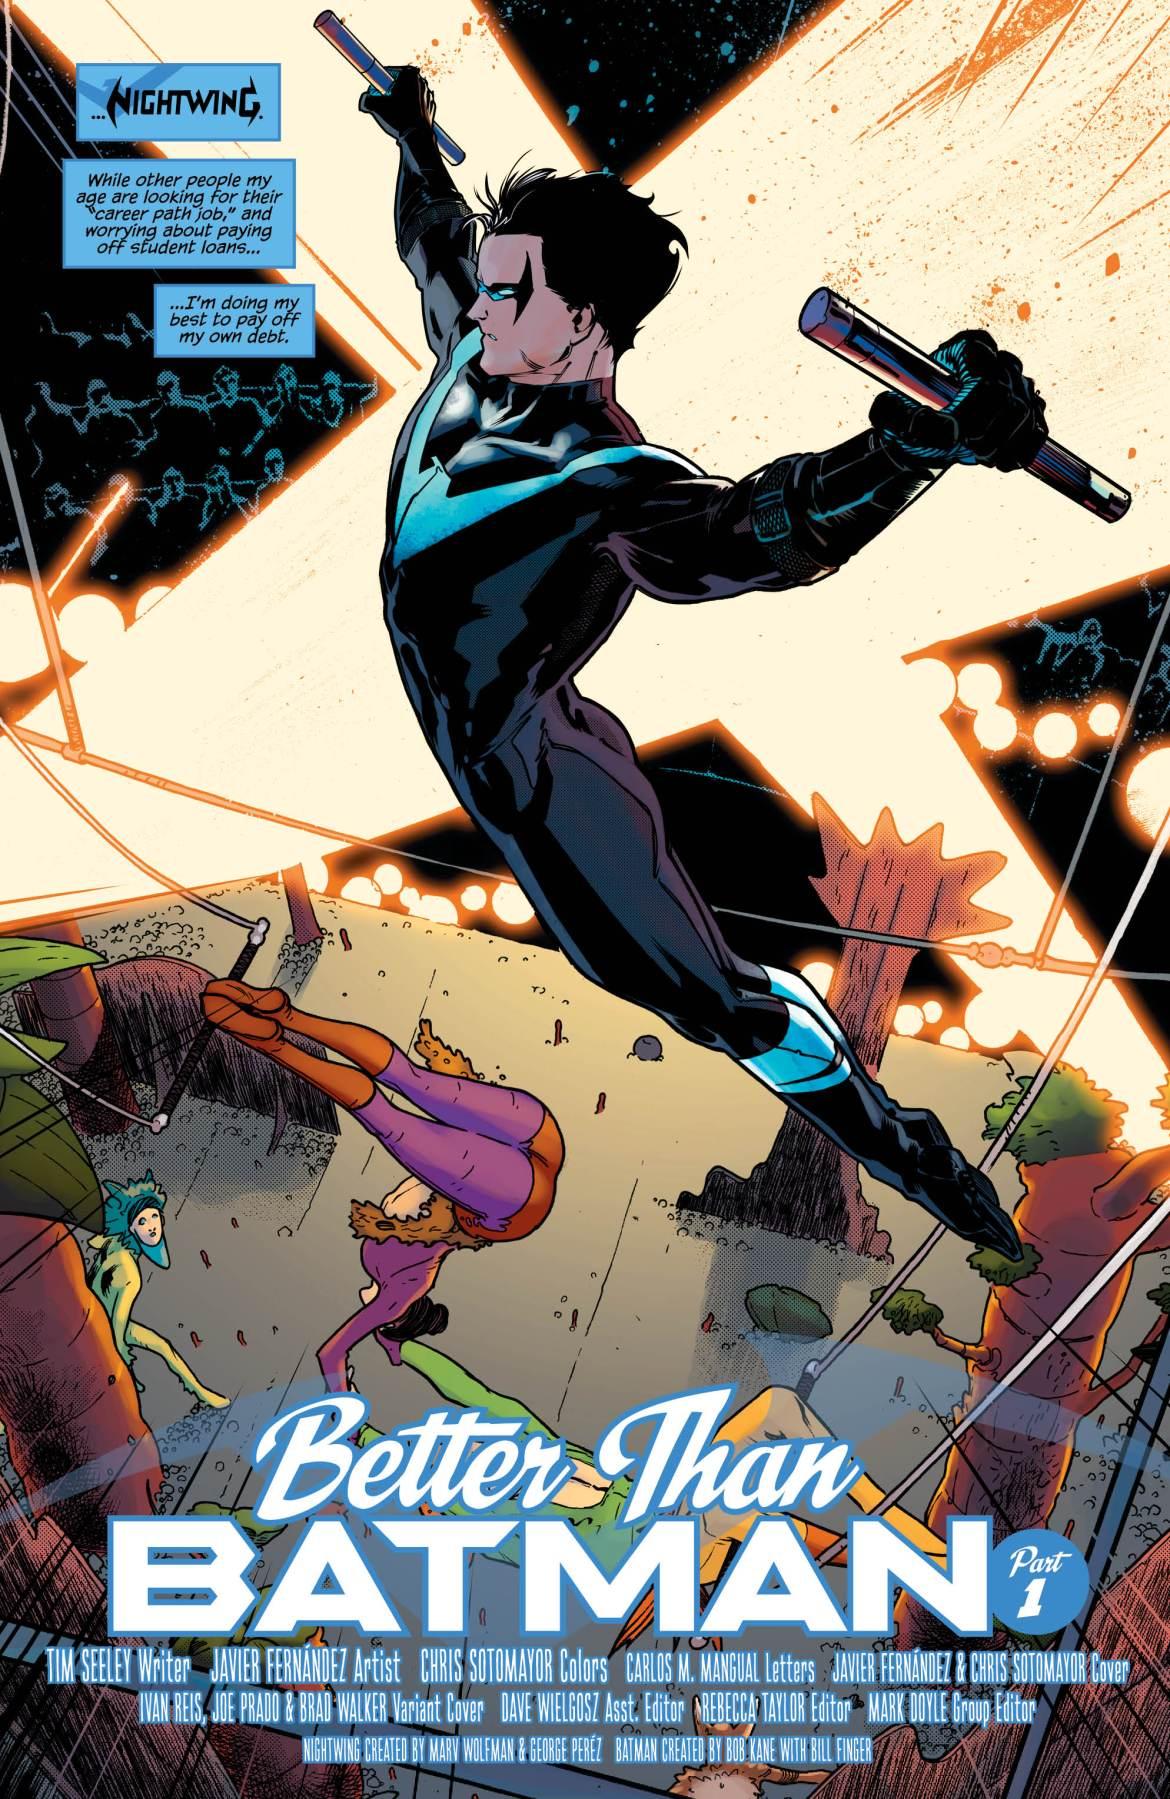 Nightwing Vol. 1: Better Than Batman – Review